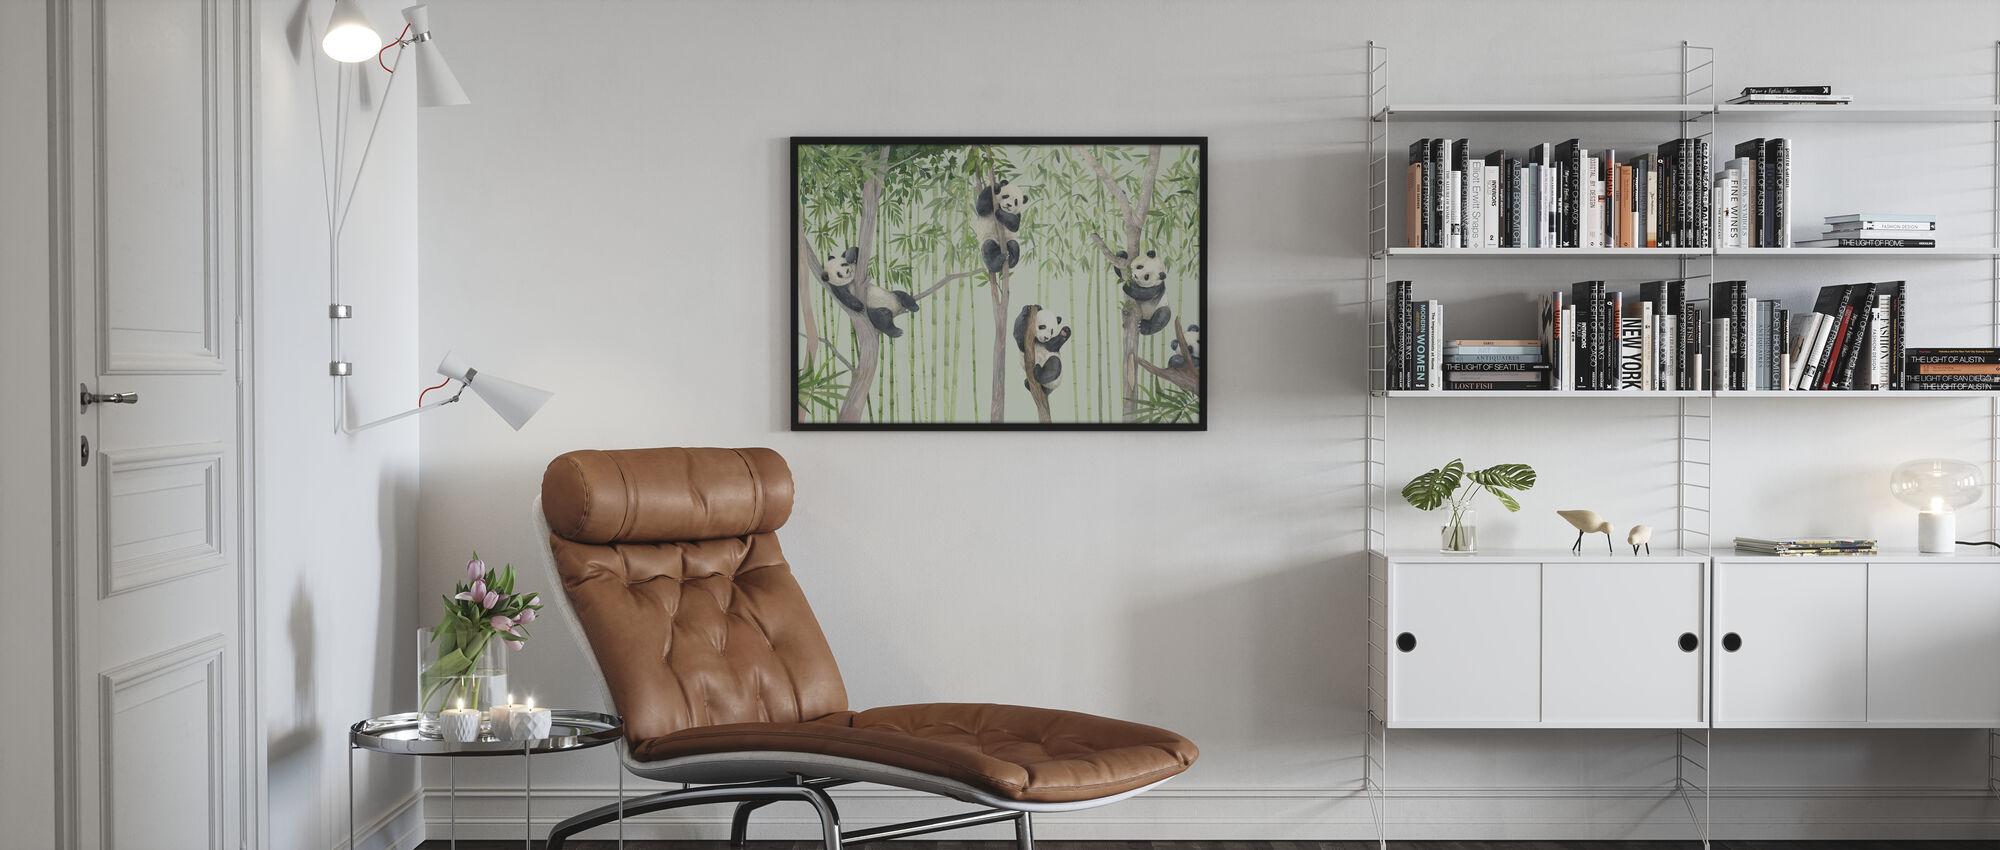 Panda Friends - Poster - Living Room